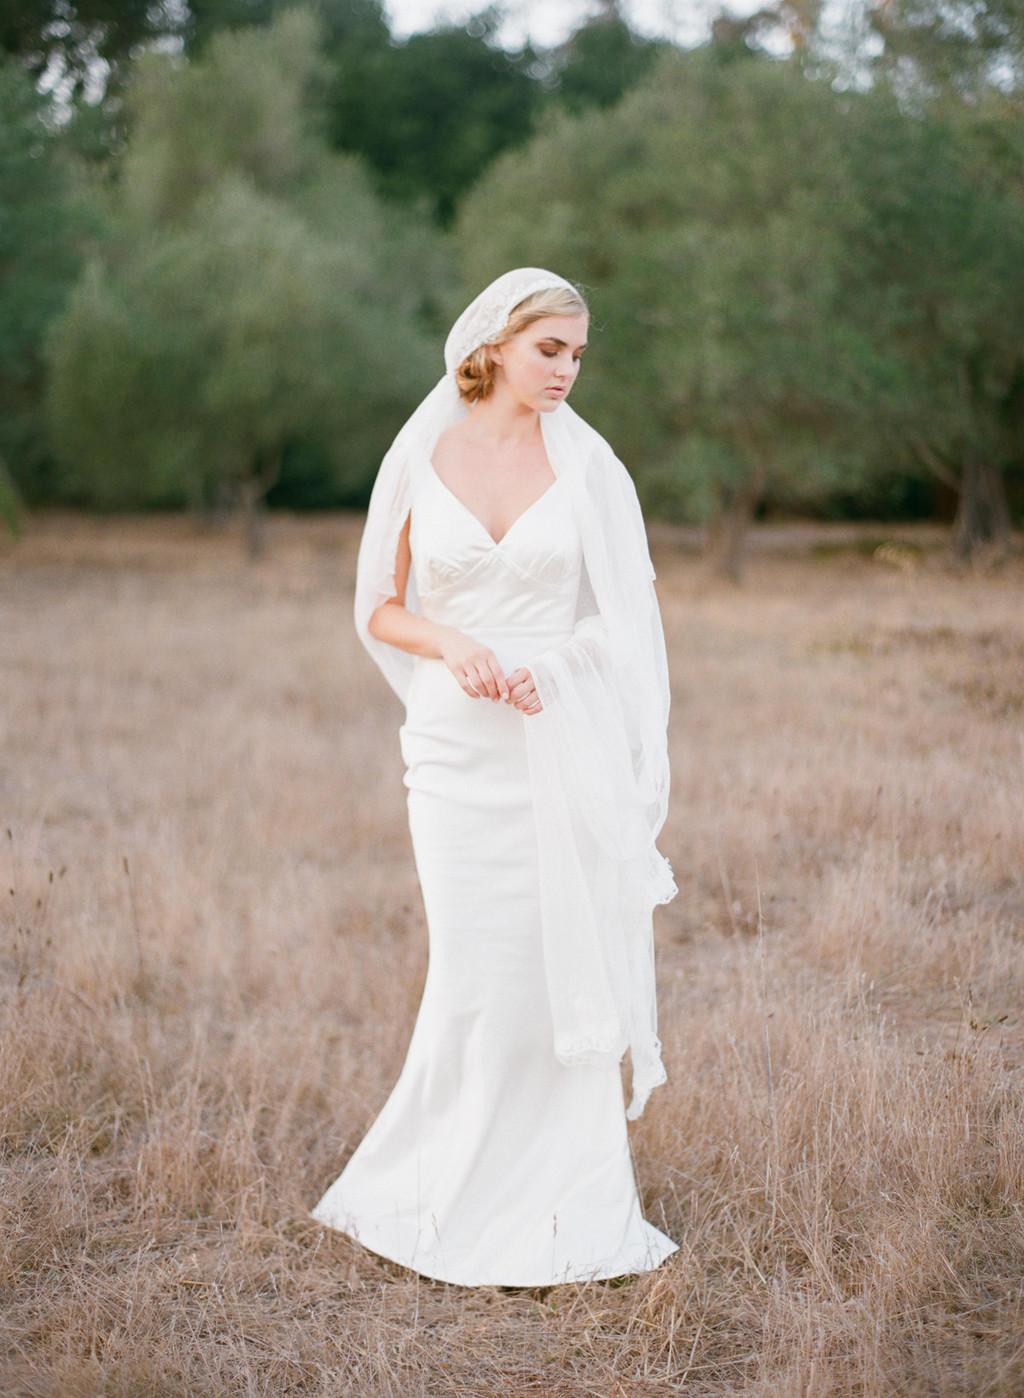 Vidonia-2013-wedding-dress-v-neck.full